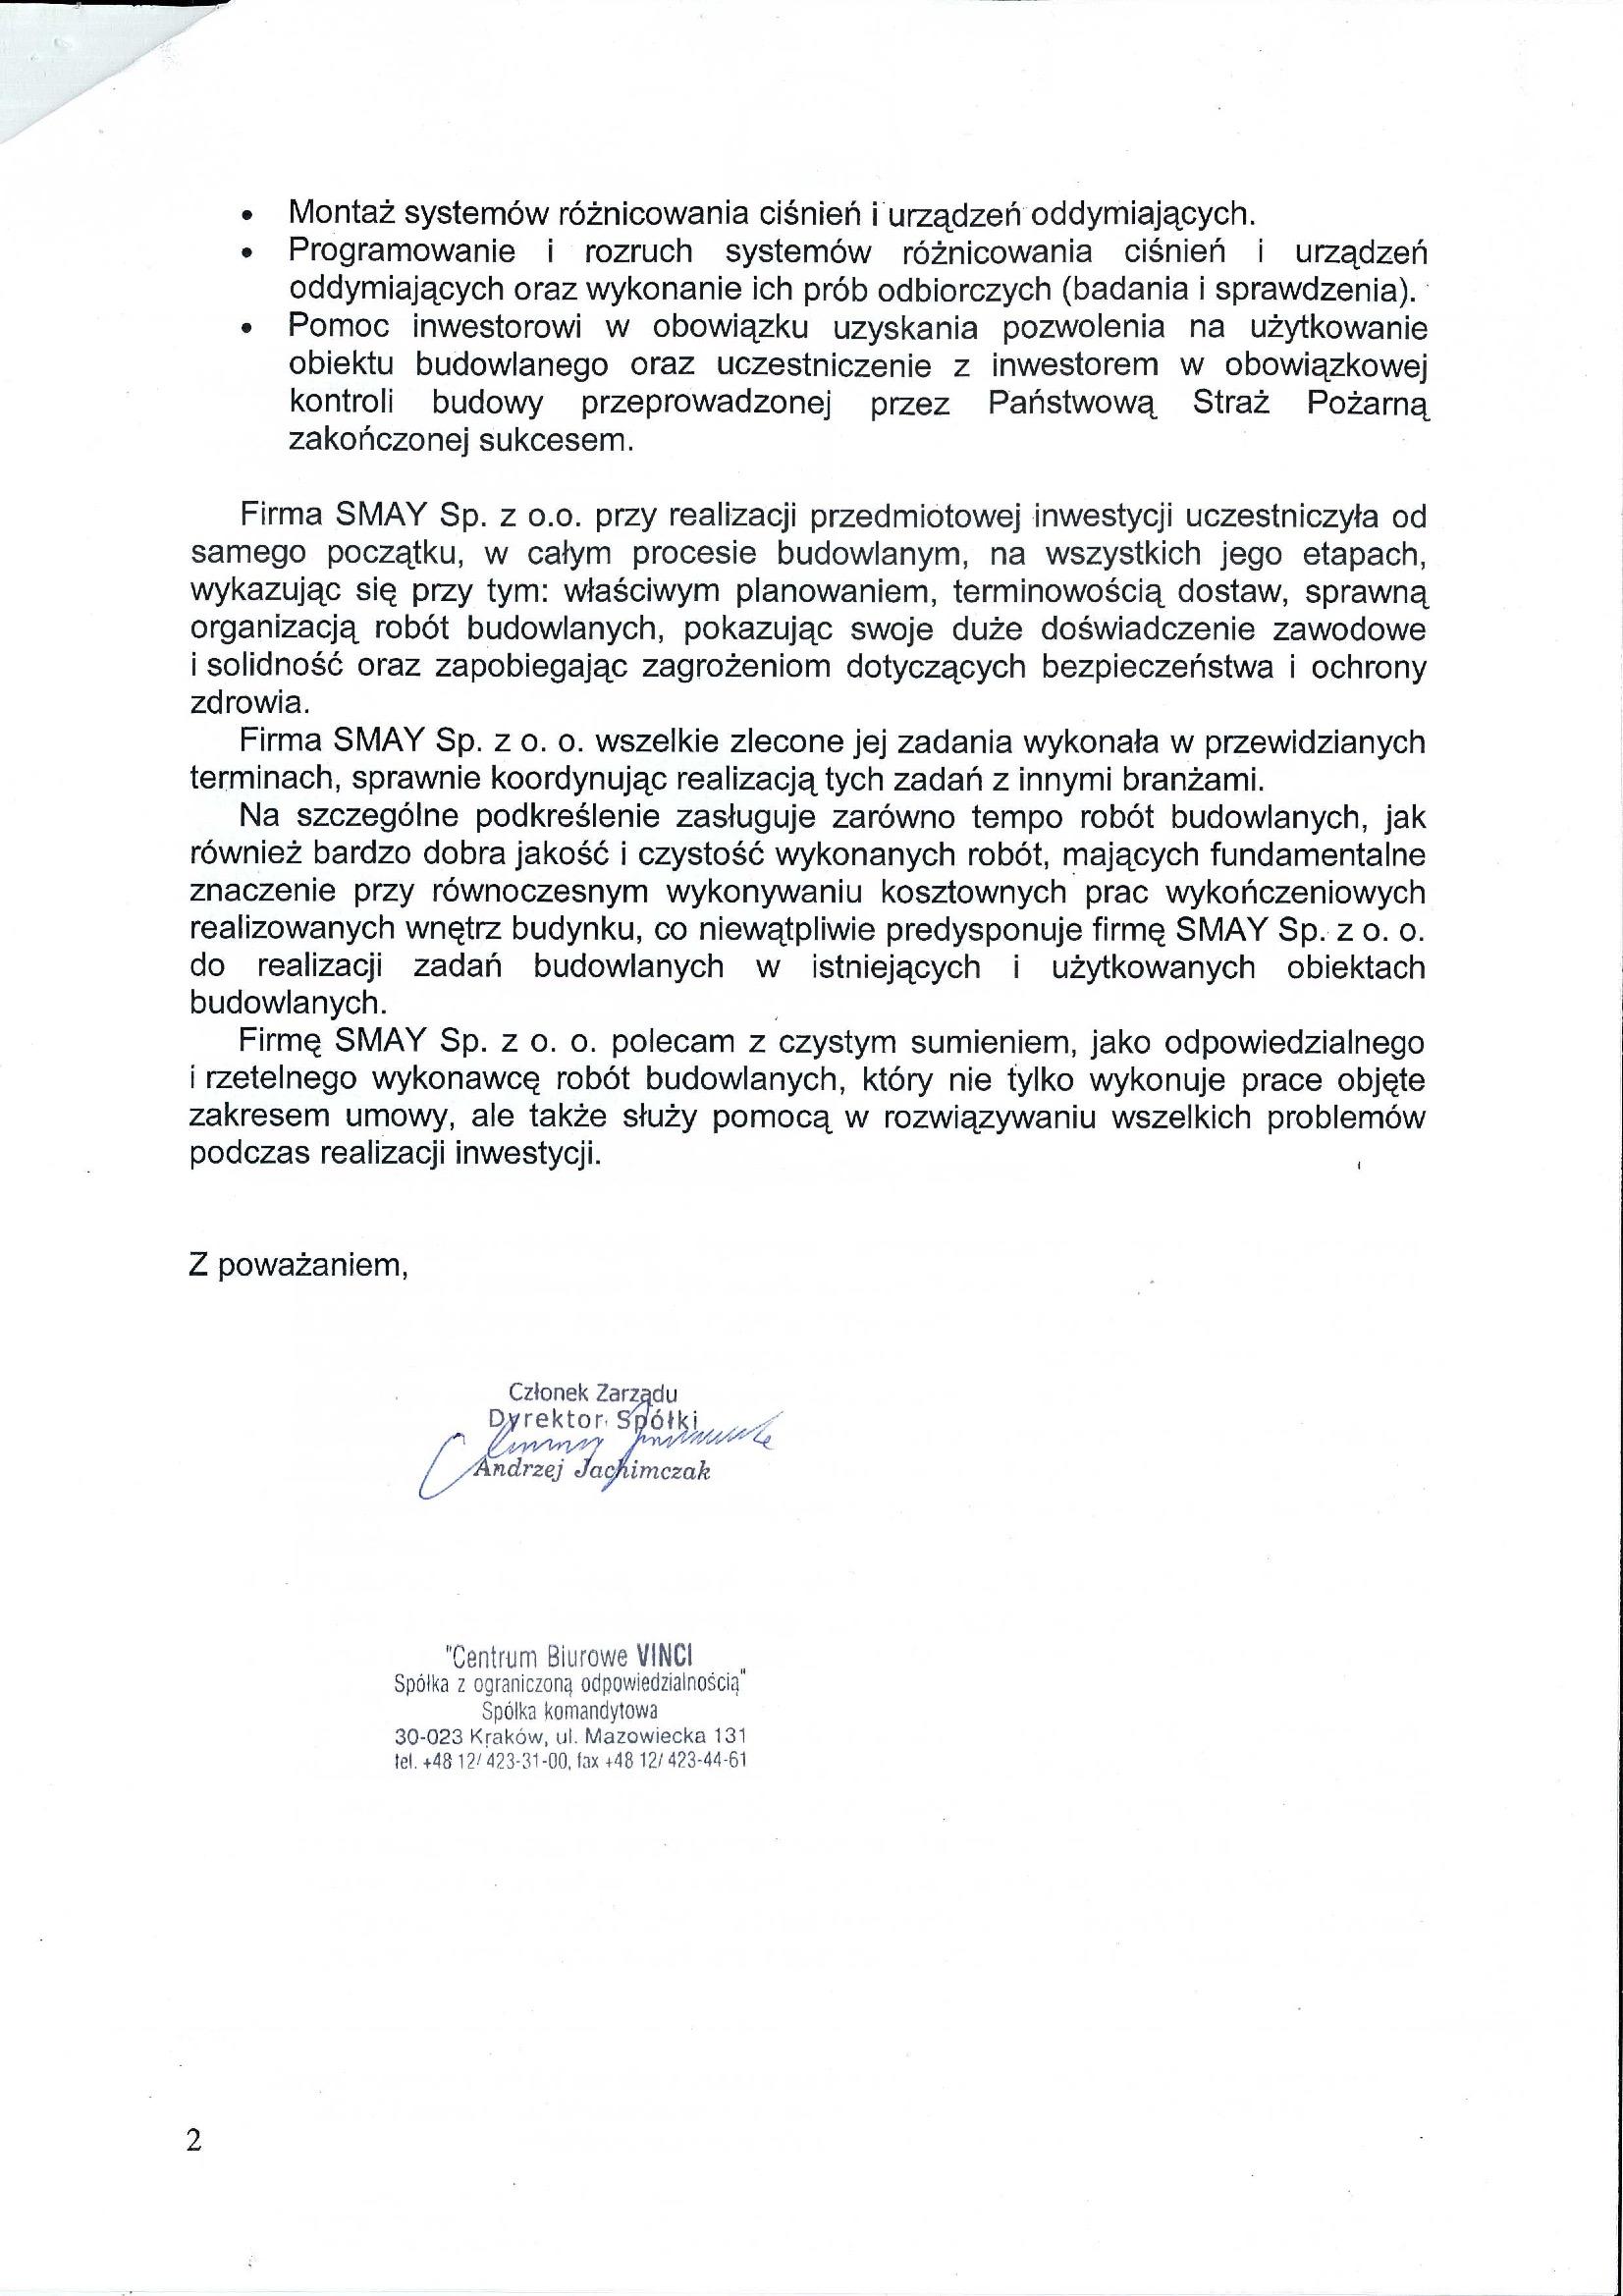 Reference - Centrum Biurowe Vinci Sp. z o.o.